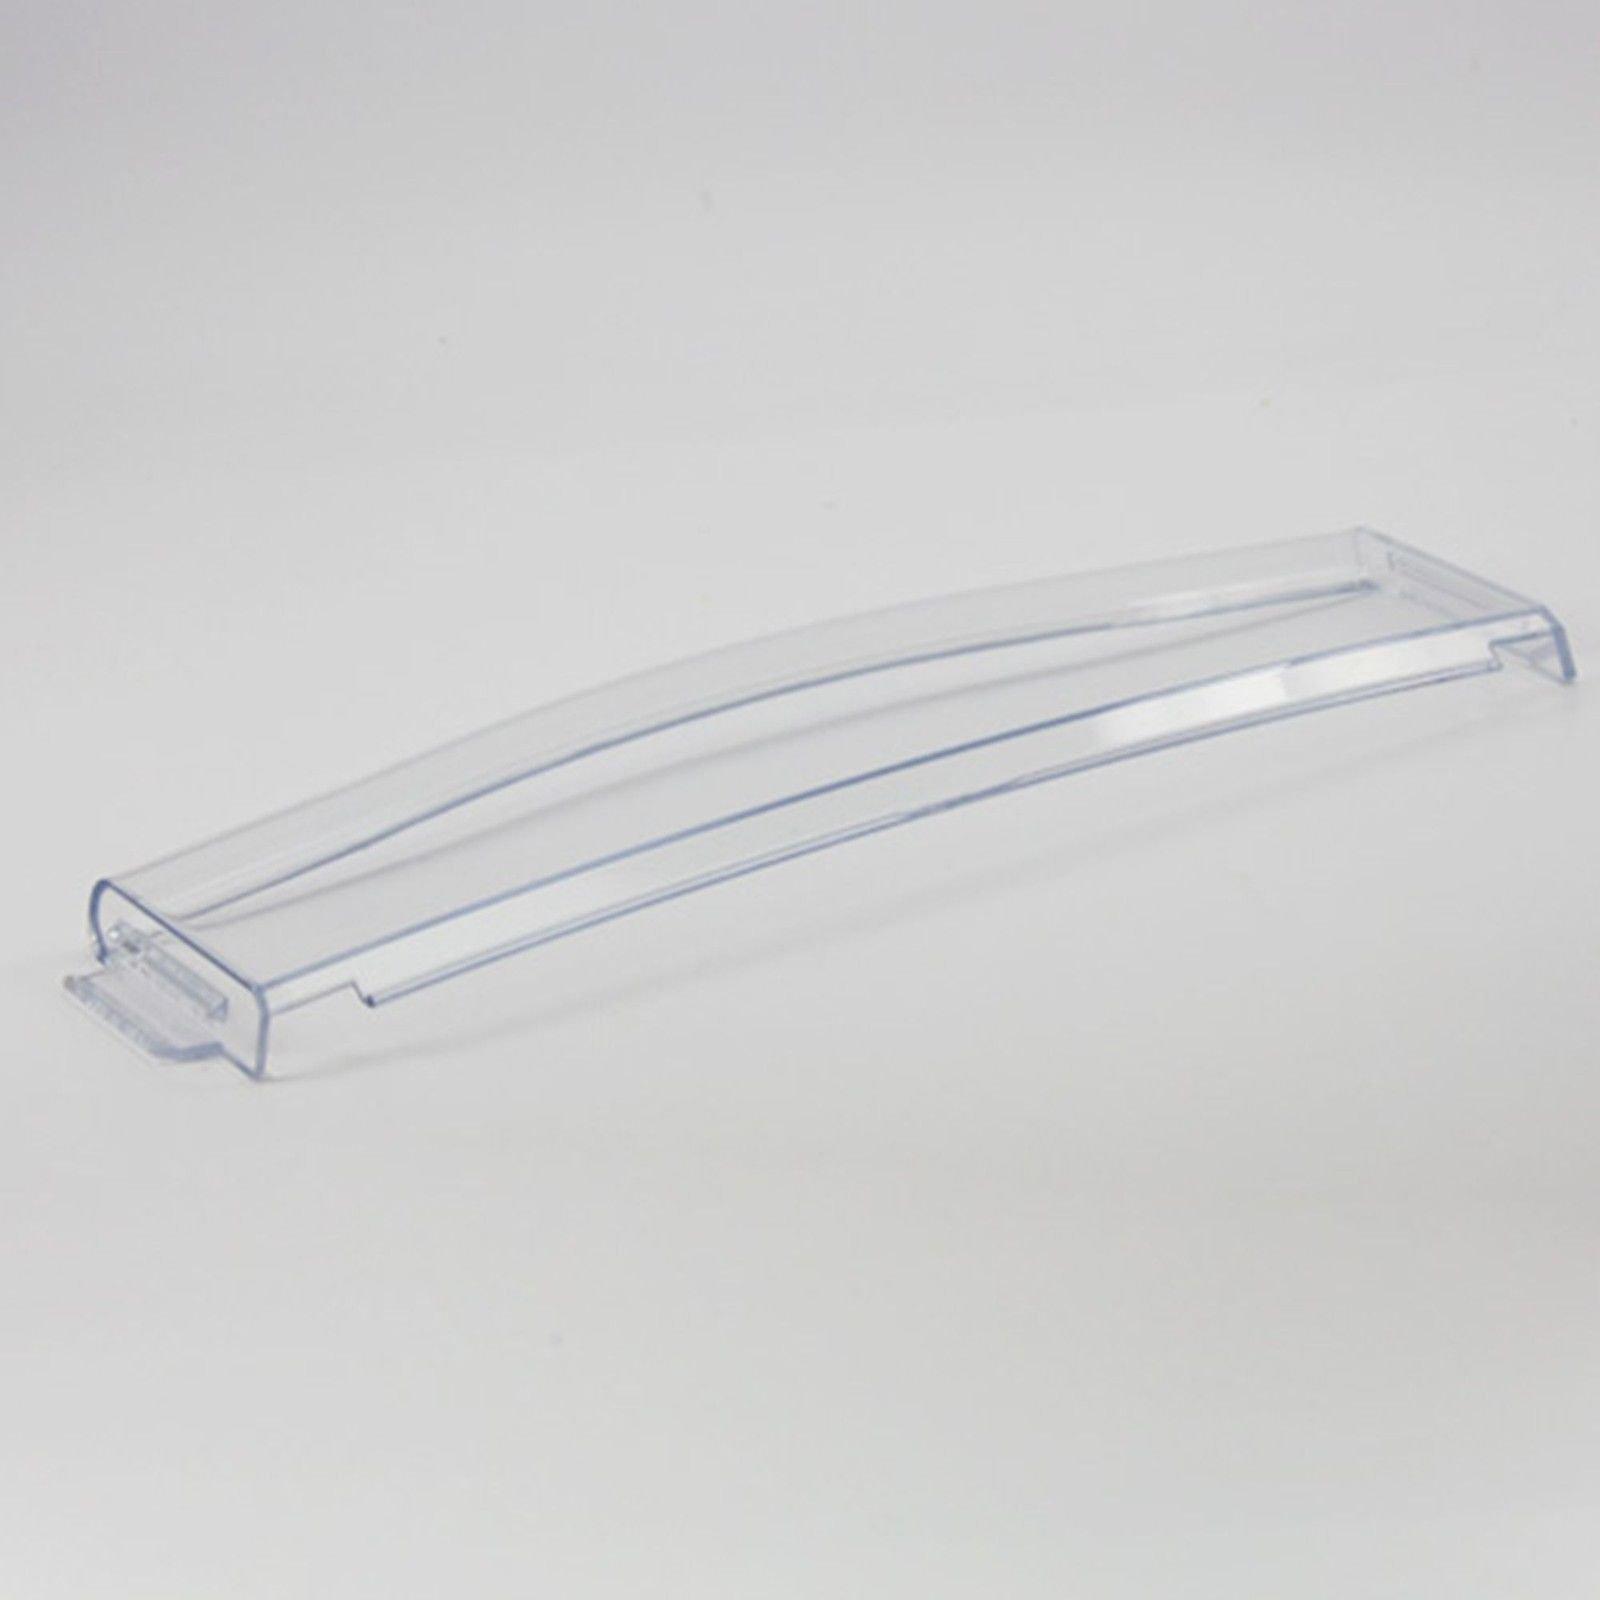 (USA Warehouse) Genuine OEM WR71X10764 GE Refrigerator Clear Door Bin Insert WR71X10380 -/PT# HF983-1754343537